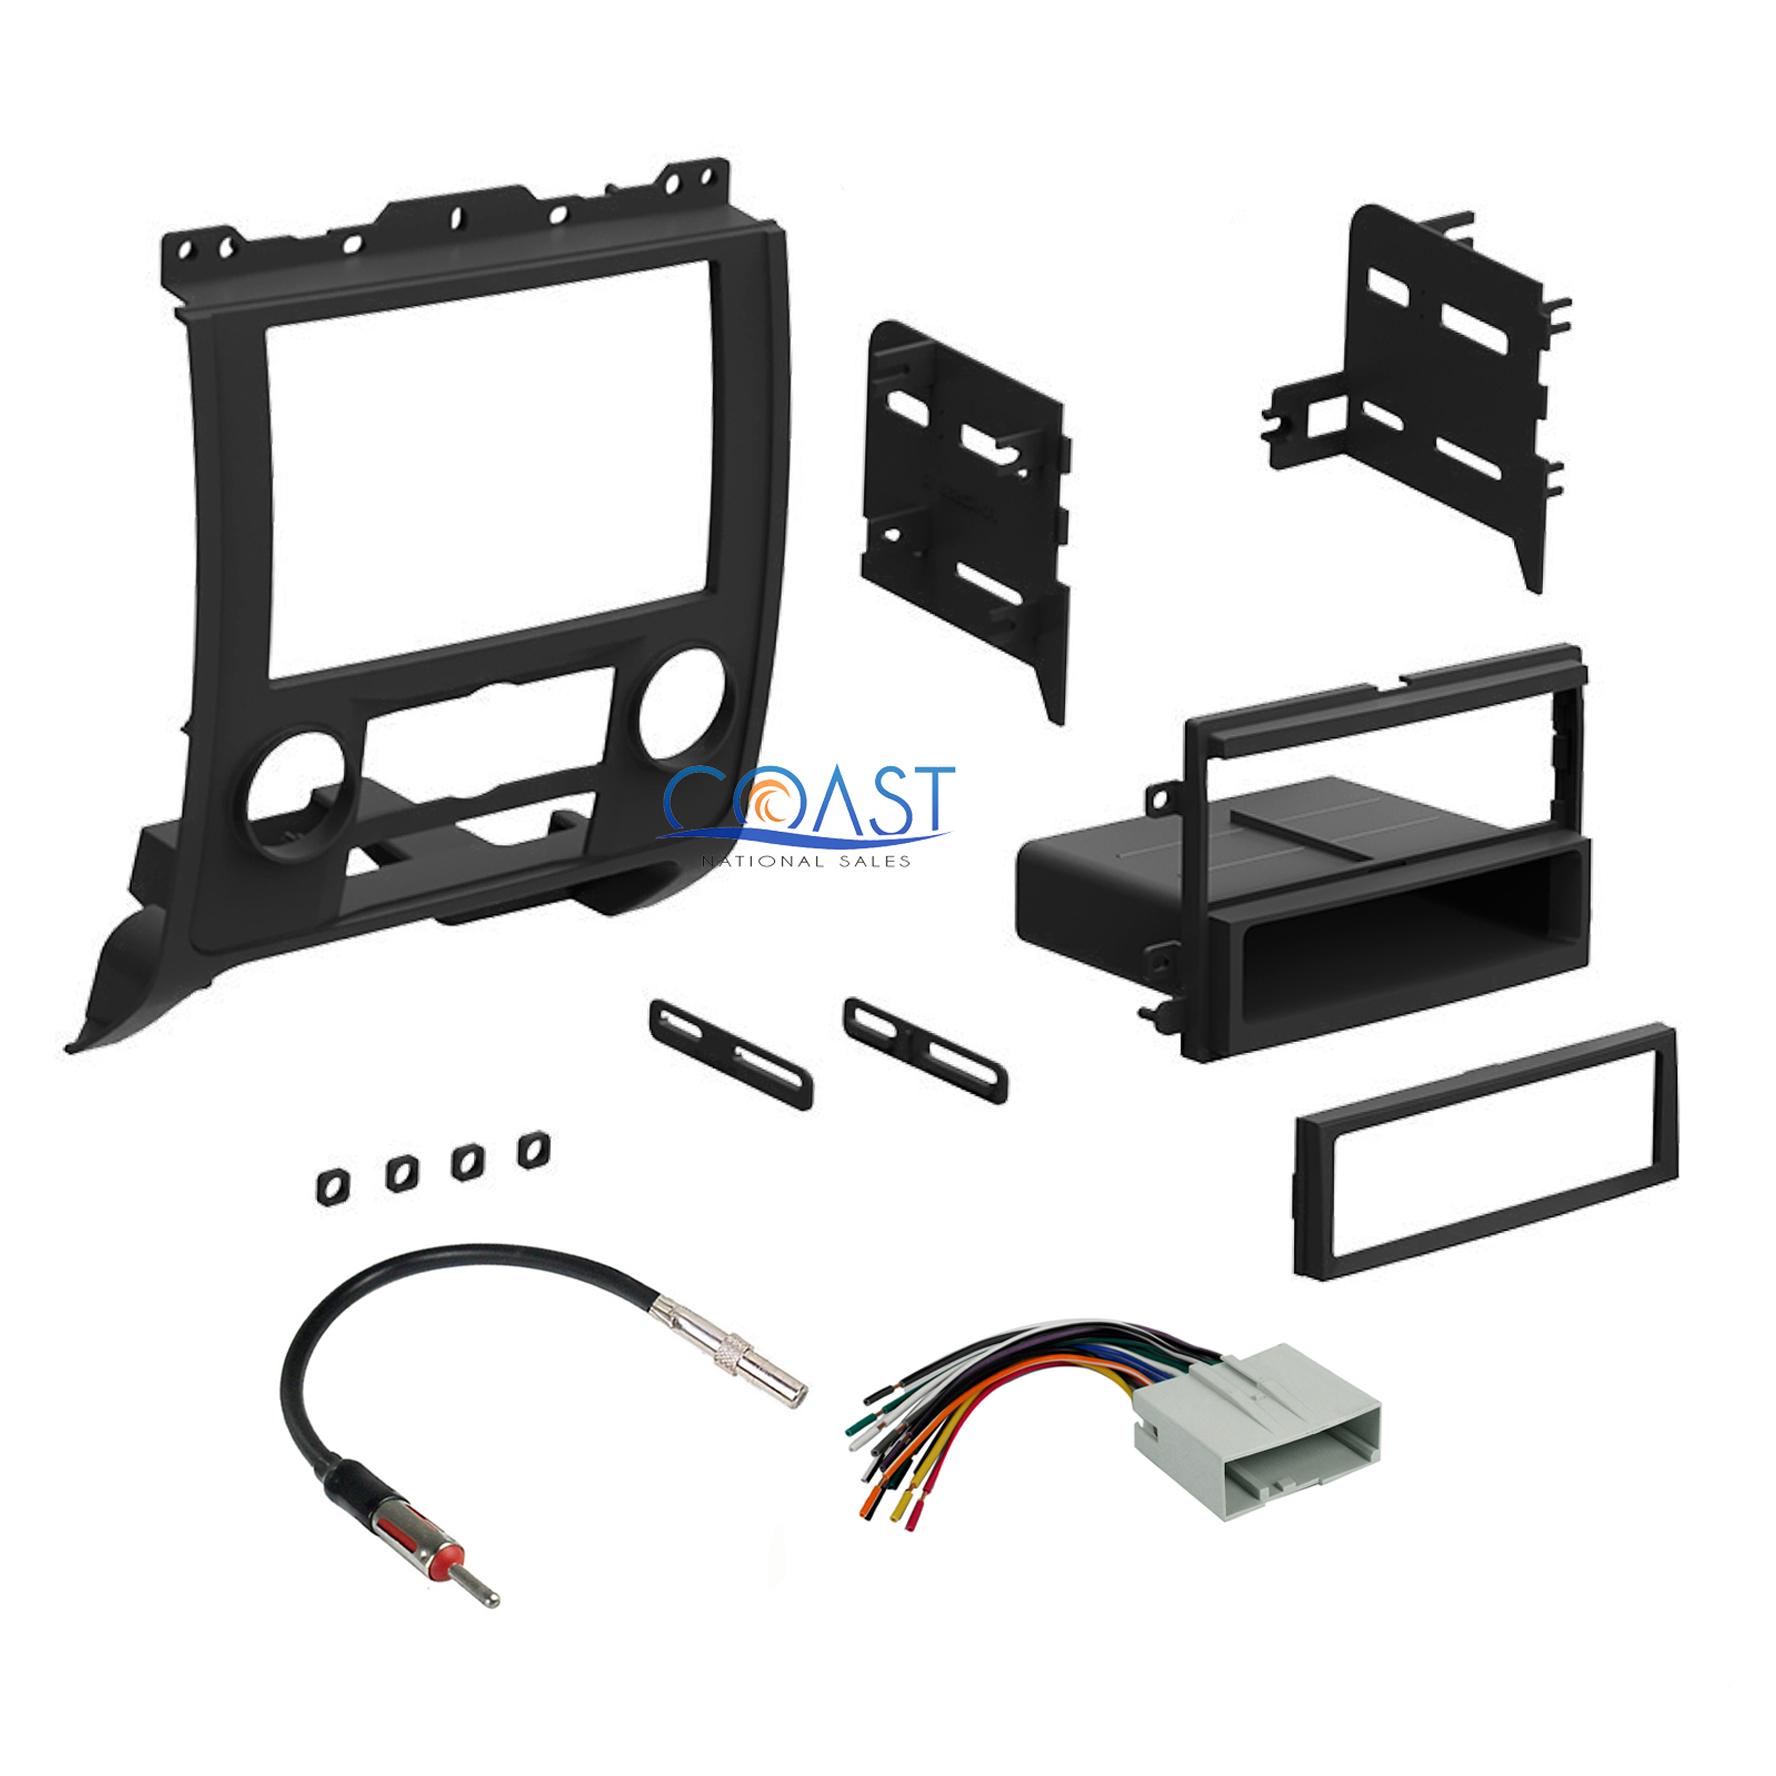 Car Radio Stereo Dash Kit Amp Harness Antenna for 2008-2011 Ford Mercury Mazda